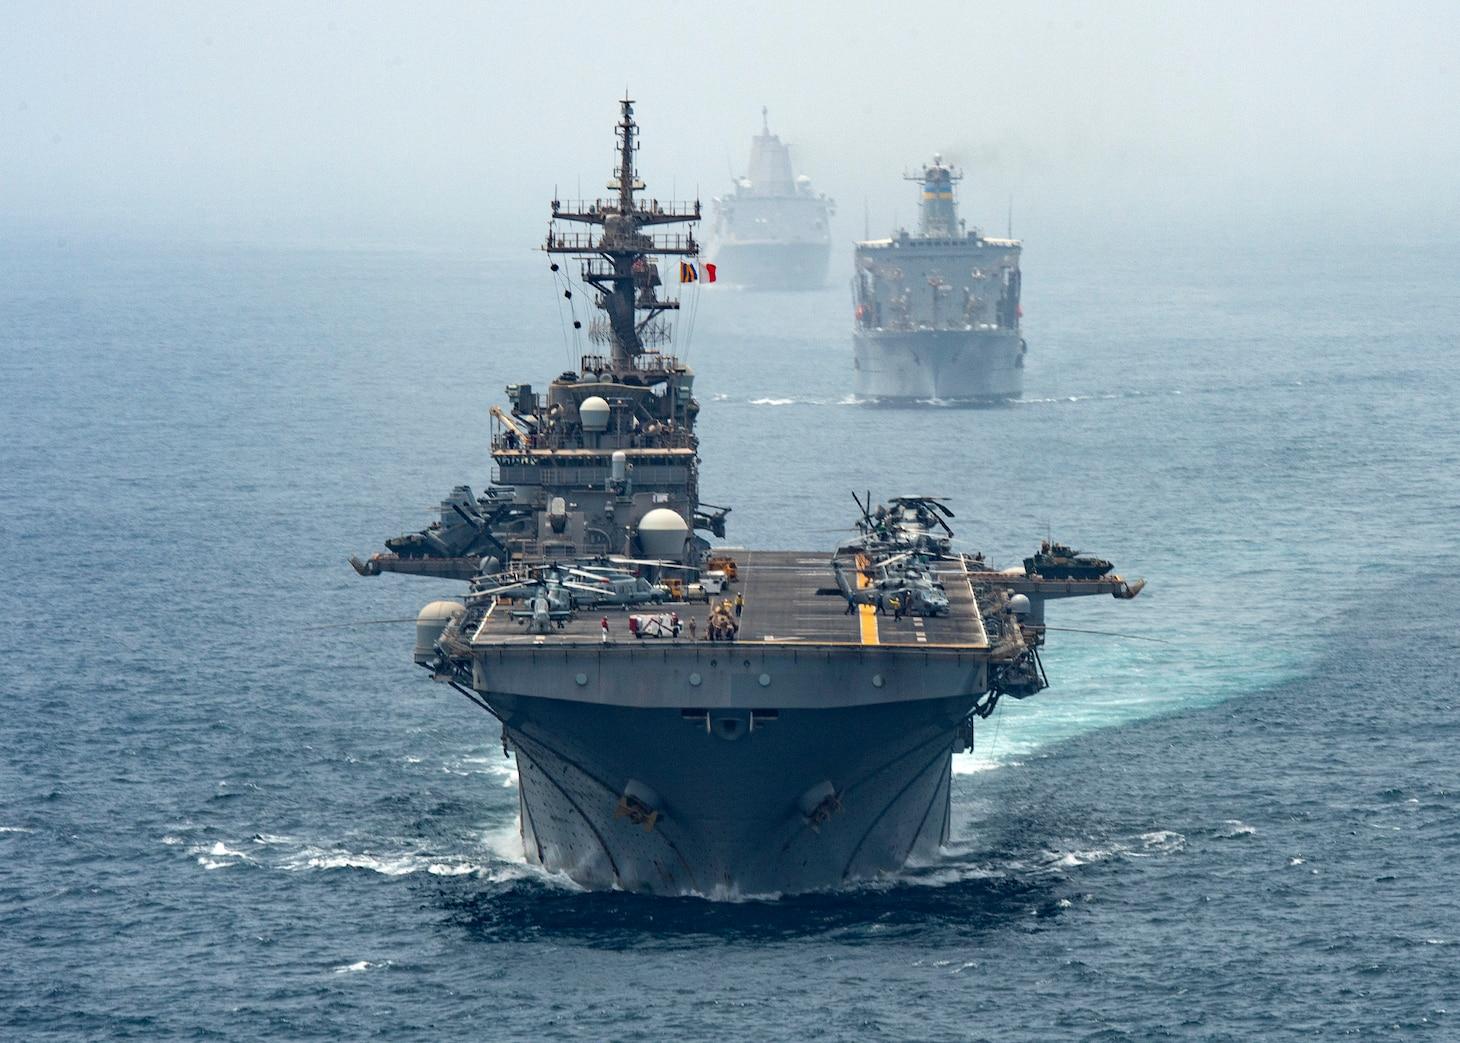 Official U.S. Navy file photo Amphibious assault ship USS Boxer (LHD 4),